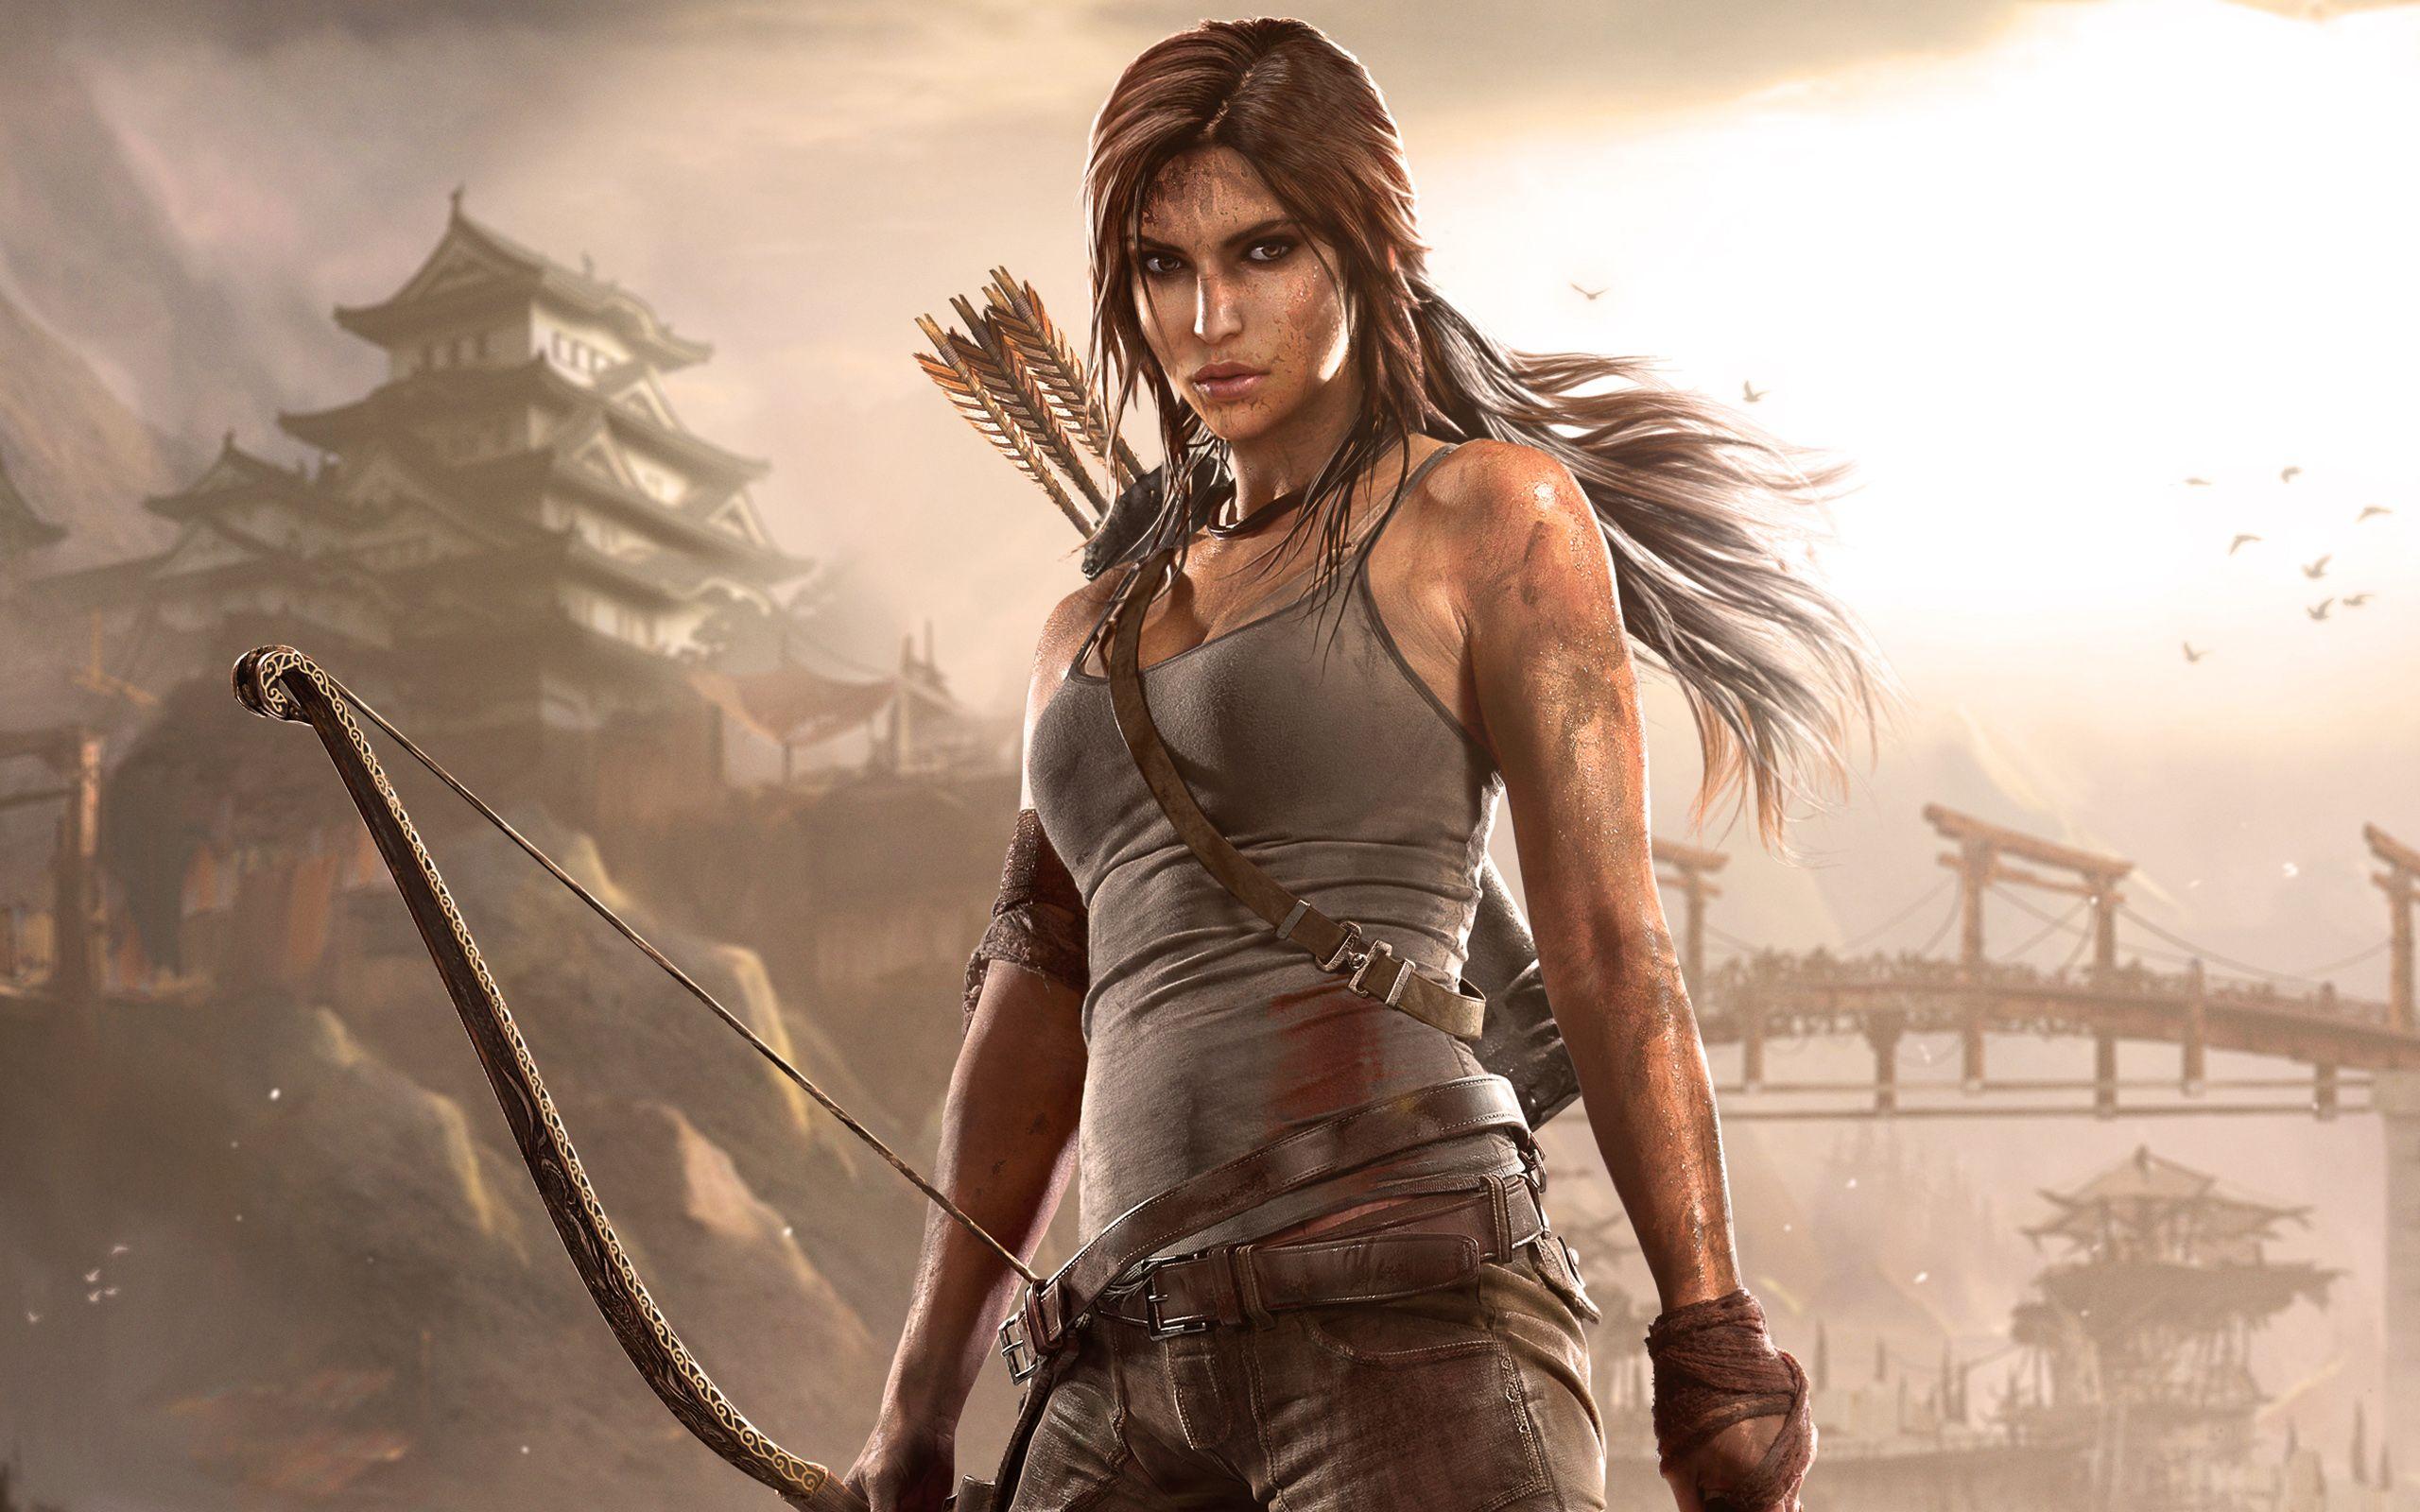 Alicia Vikander S Lara Croft Looks Just Like The New Tomb